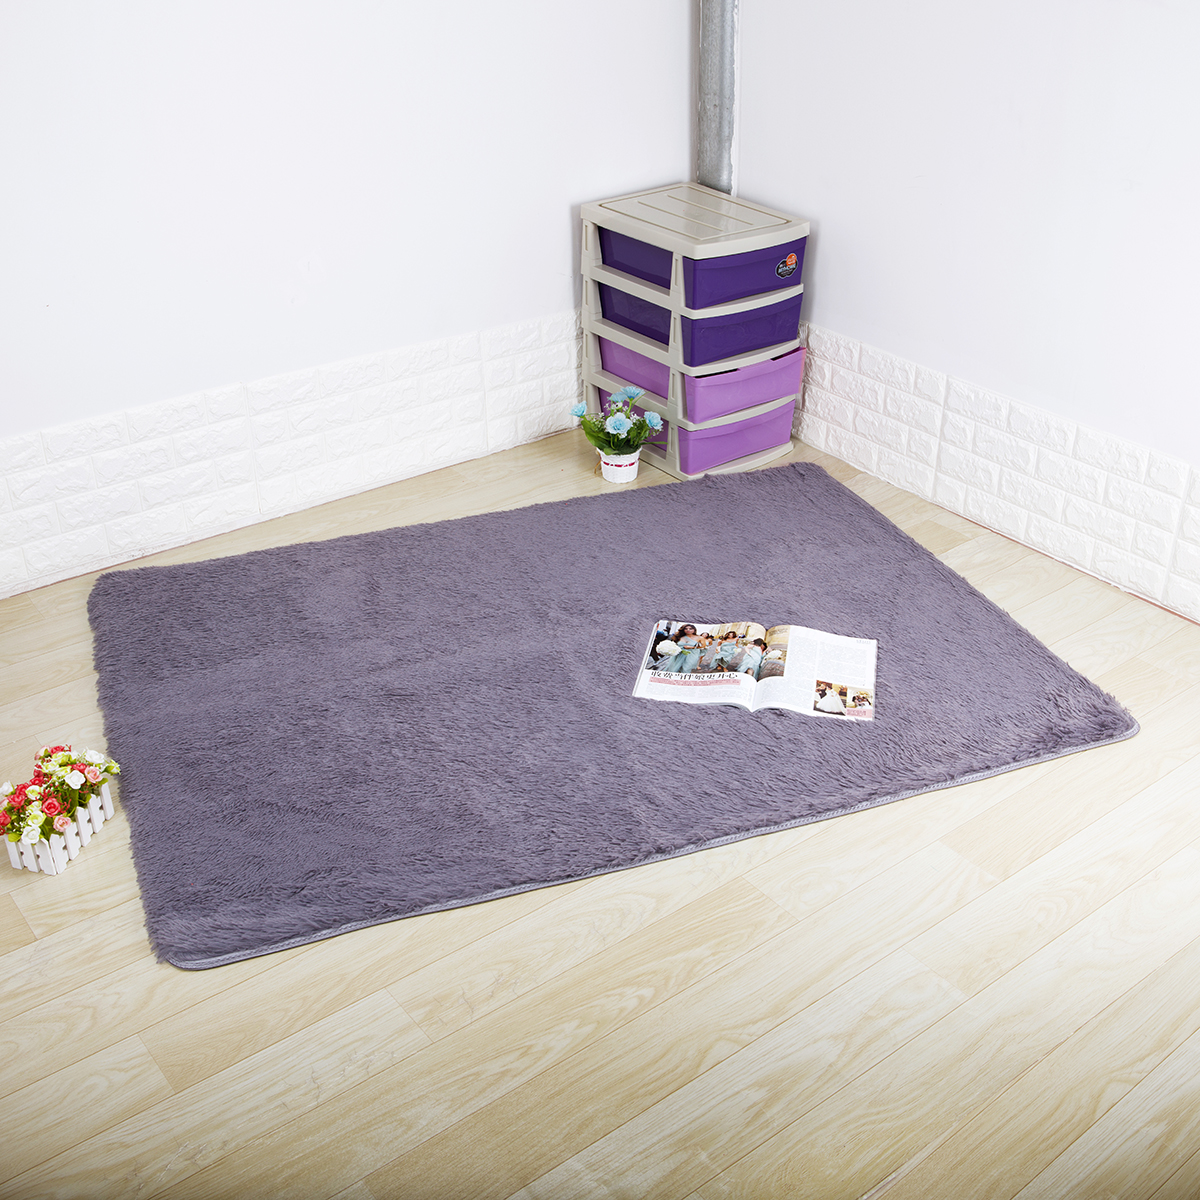 "dodoing 63''x472"" ultra soft shaggy rug fluffy area rugs"